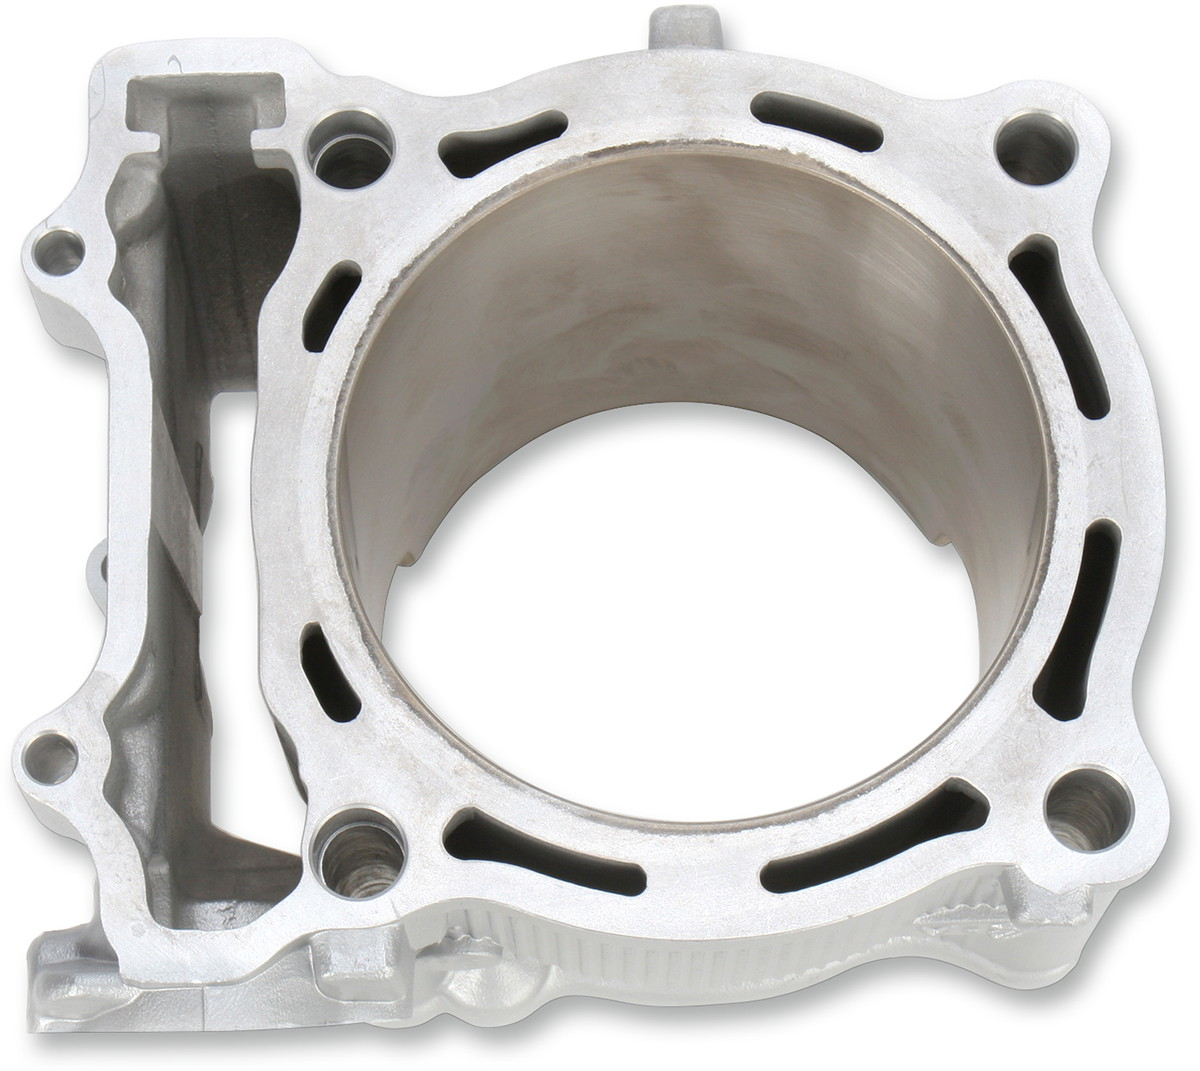 【MOOSE RACING】維修用汽缸 [0931-0450] - 「Webike-摩托百貨」